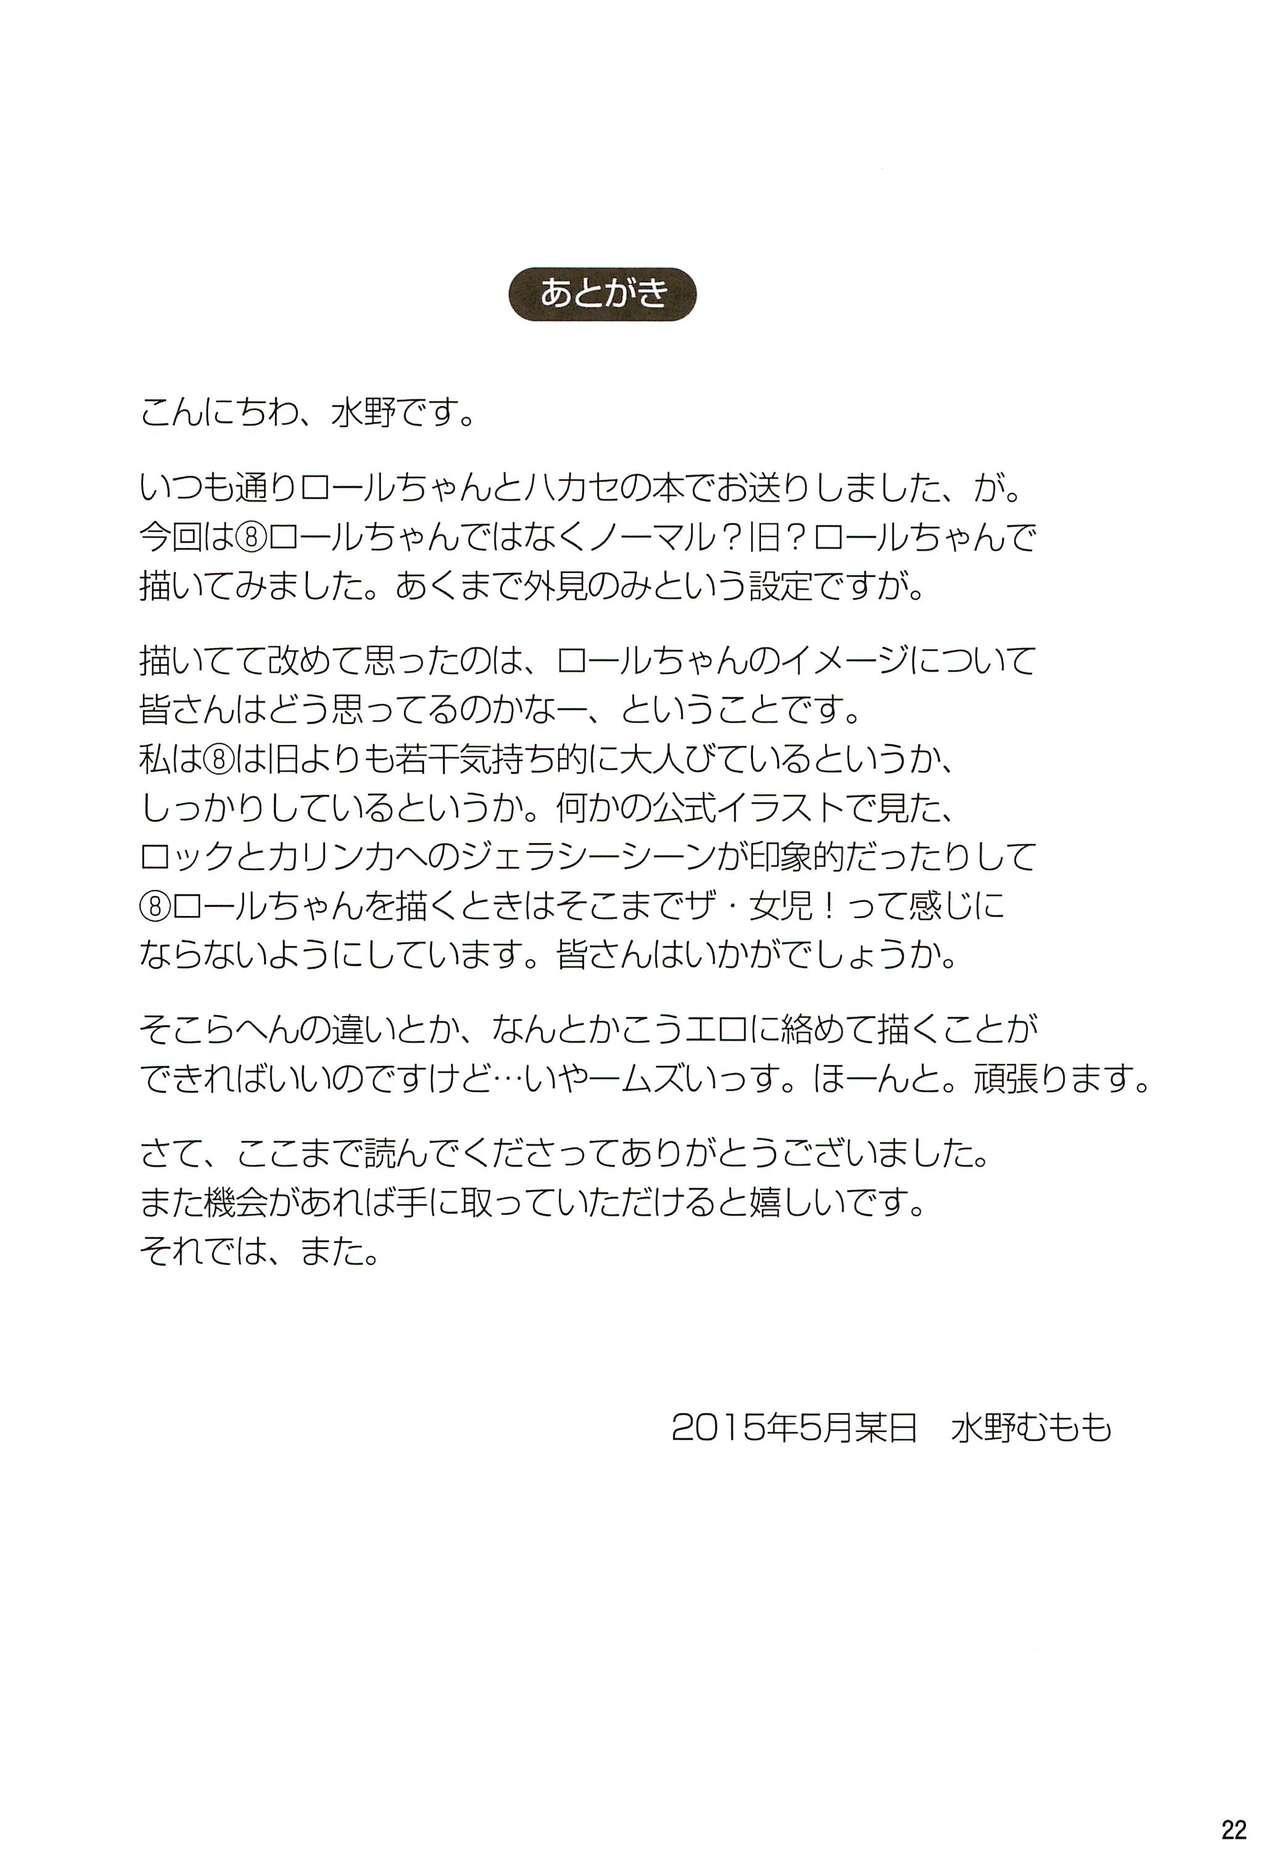 Roll-chan to Hakase no Nichijou 21